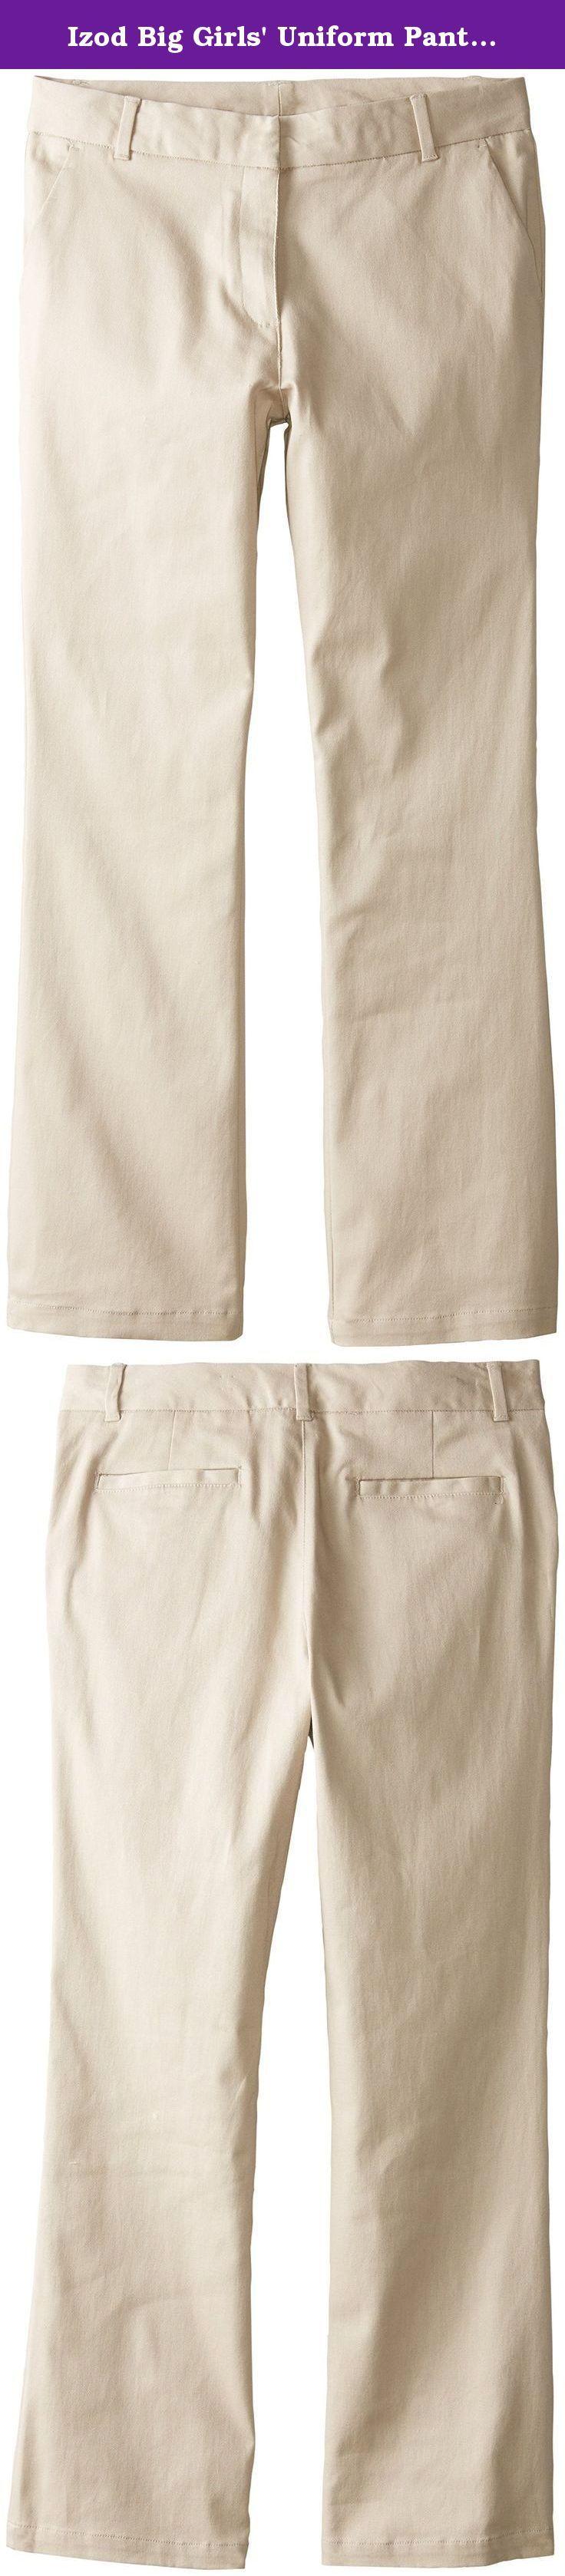 Izod Big Girls' Uniform Pant Plus Size, Khaki, 12.5. Izod uniform pant plus size.